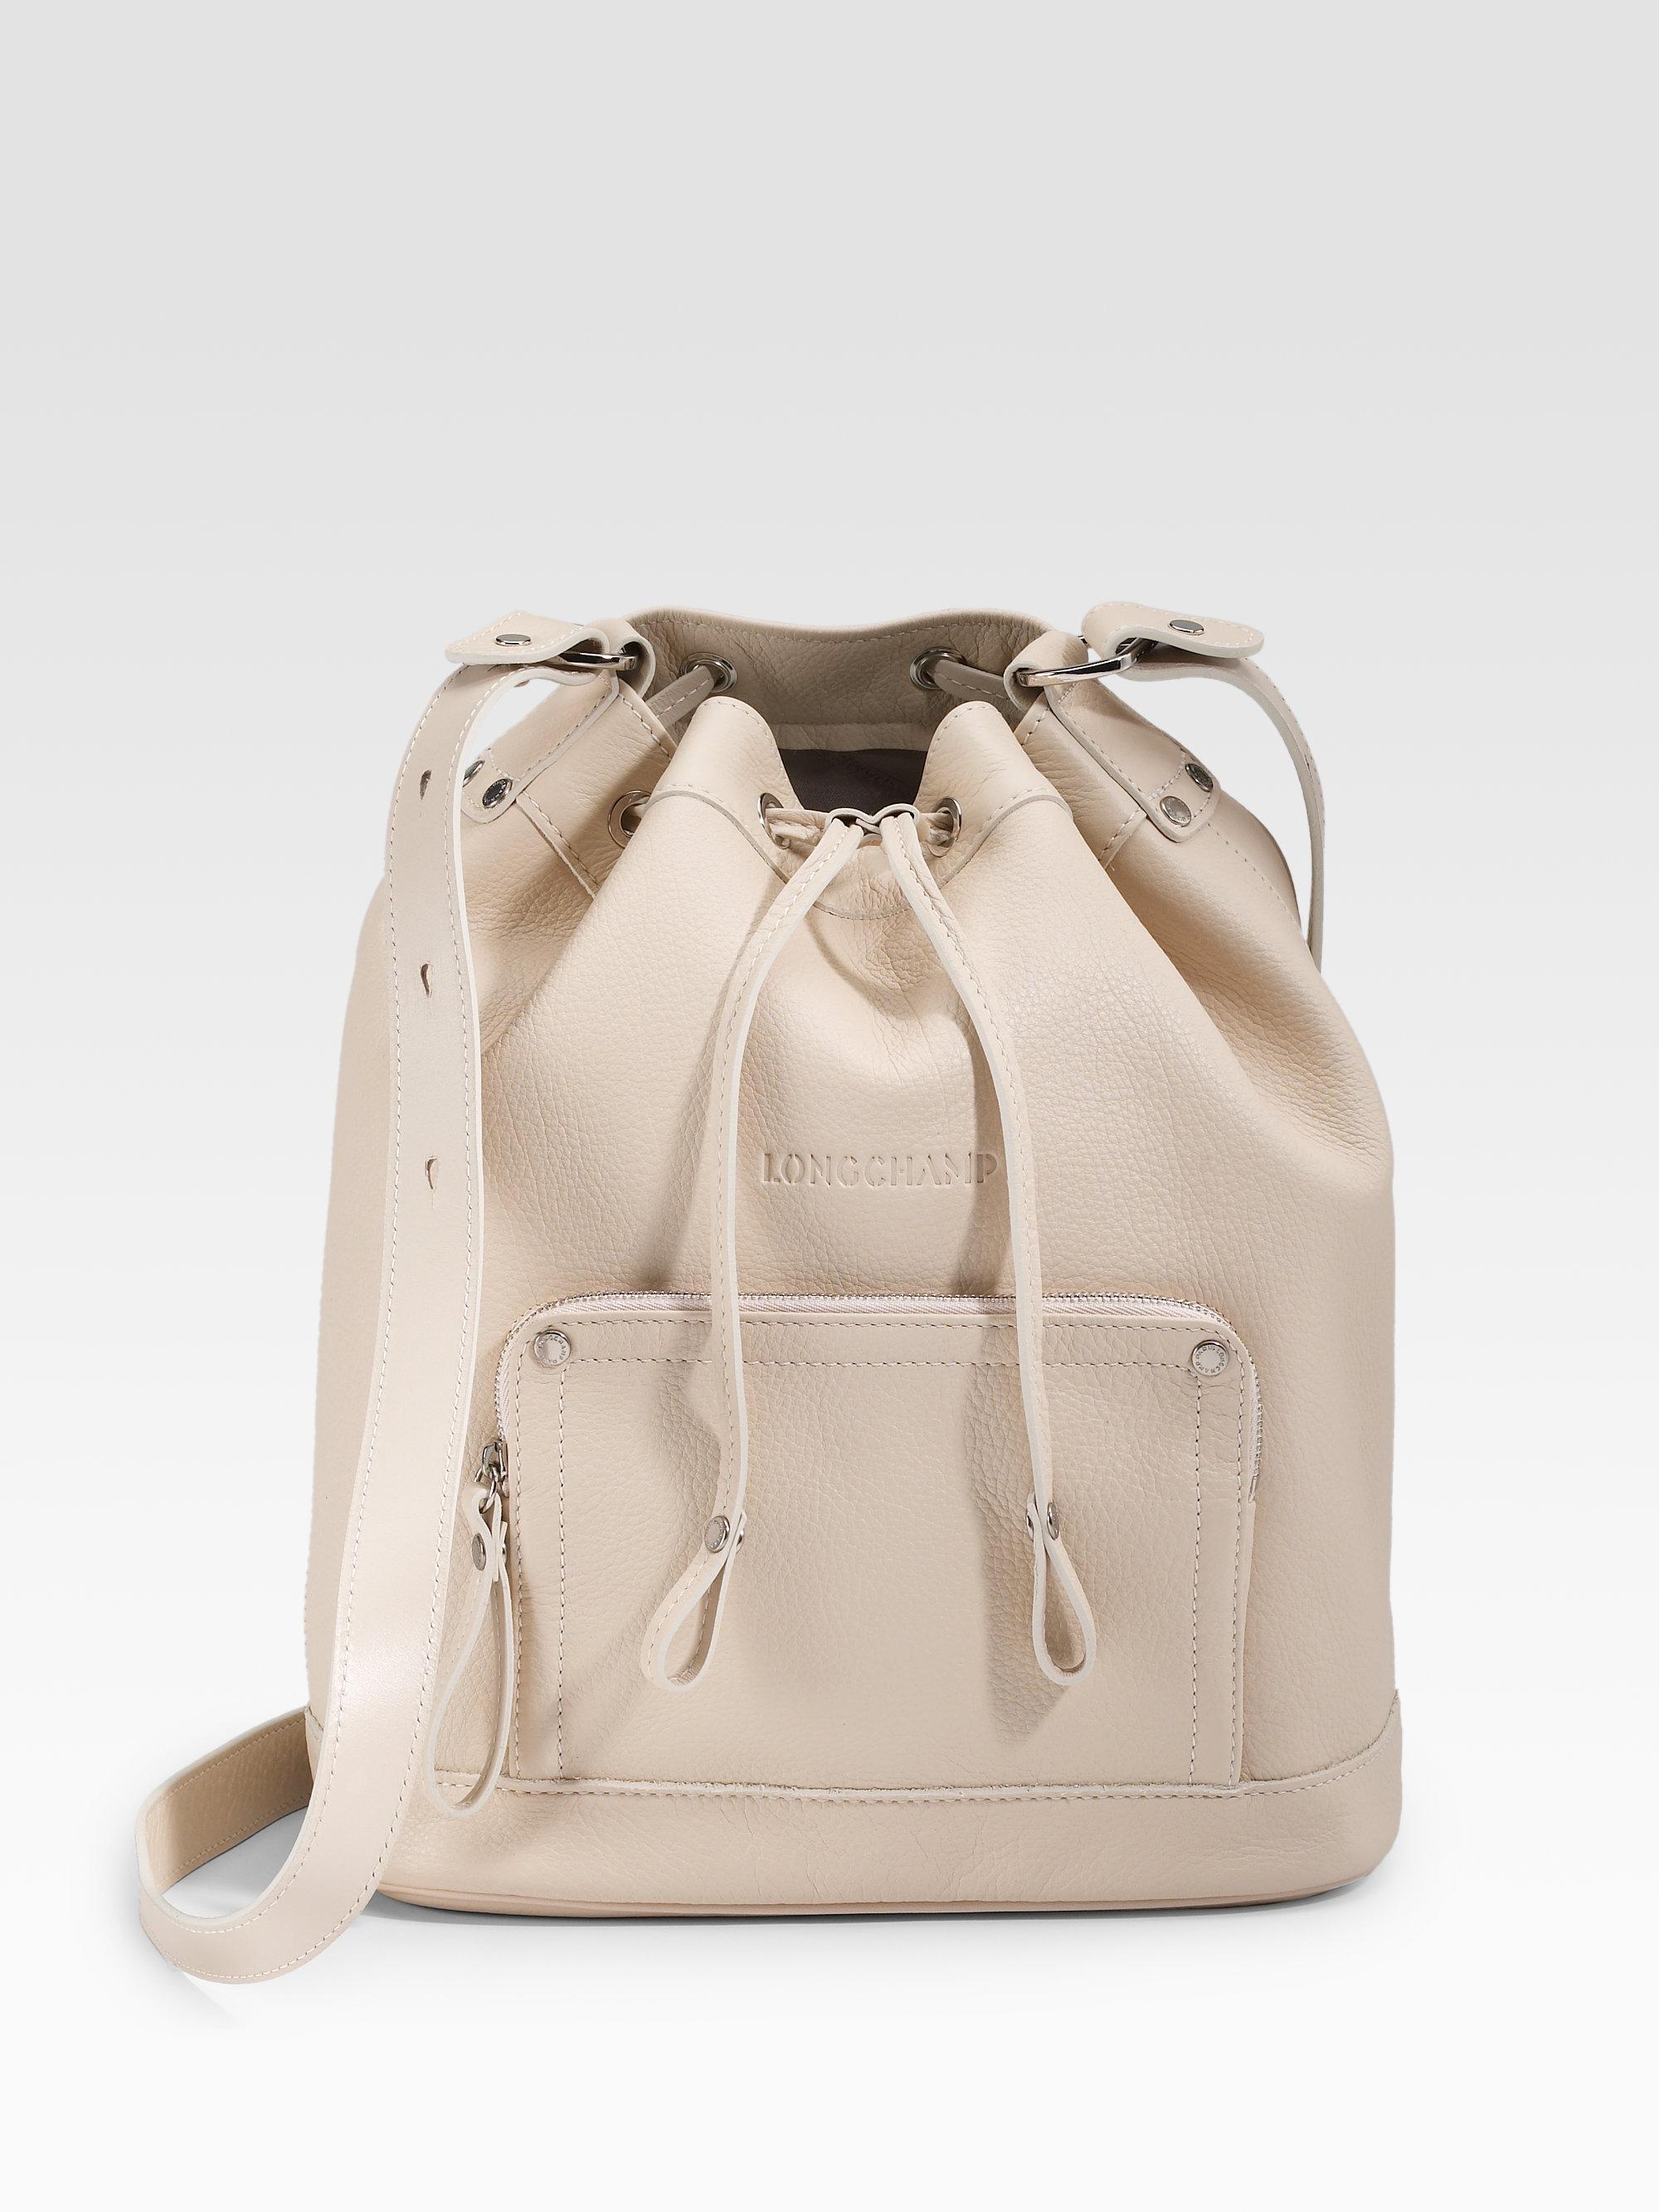 Lyst - Longchamp Drawstring Leather Shoulder Bag in Natural e35b7bcceb